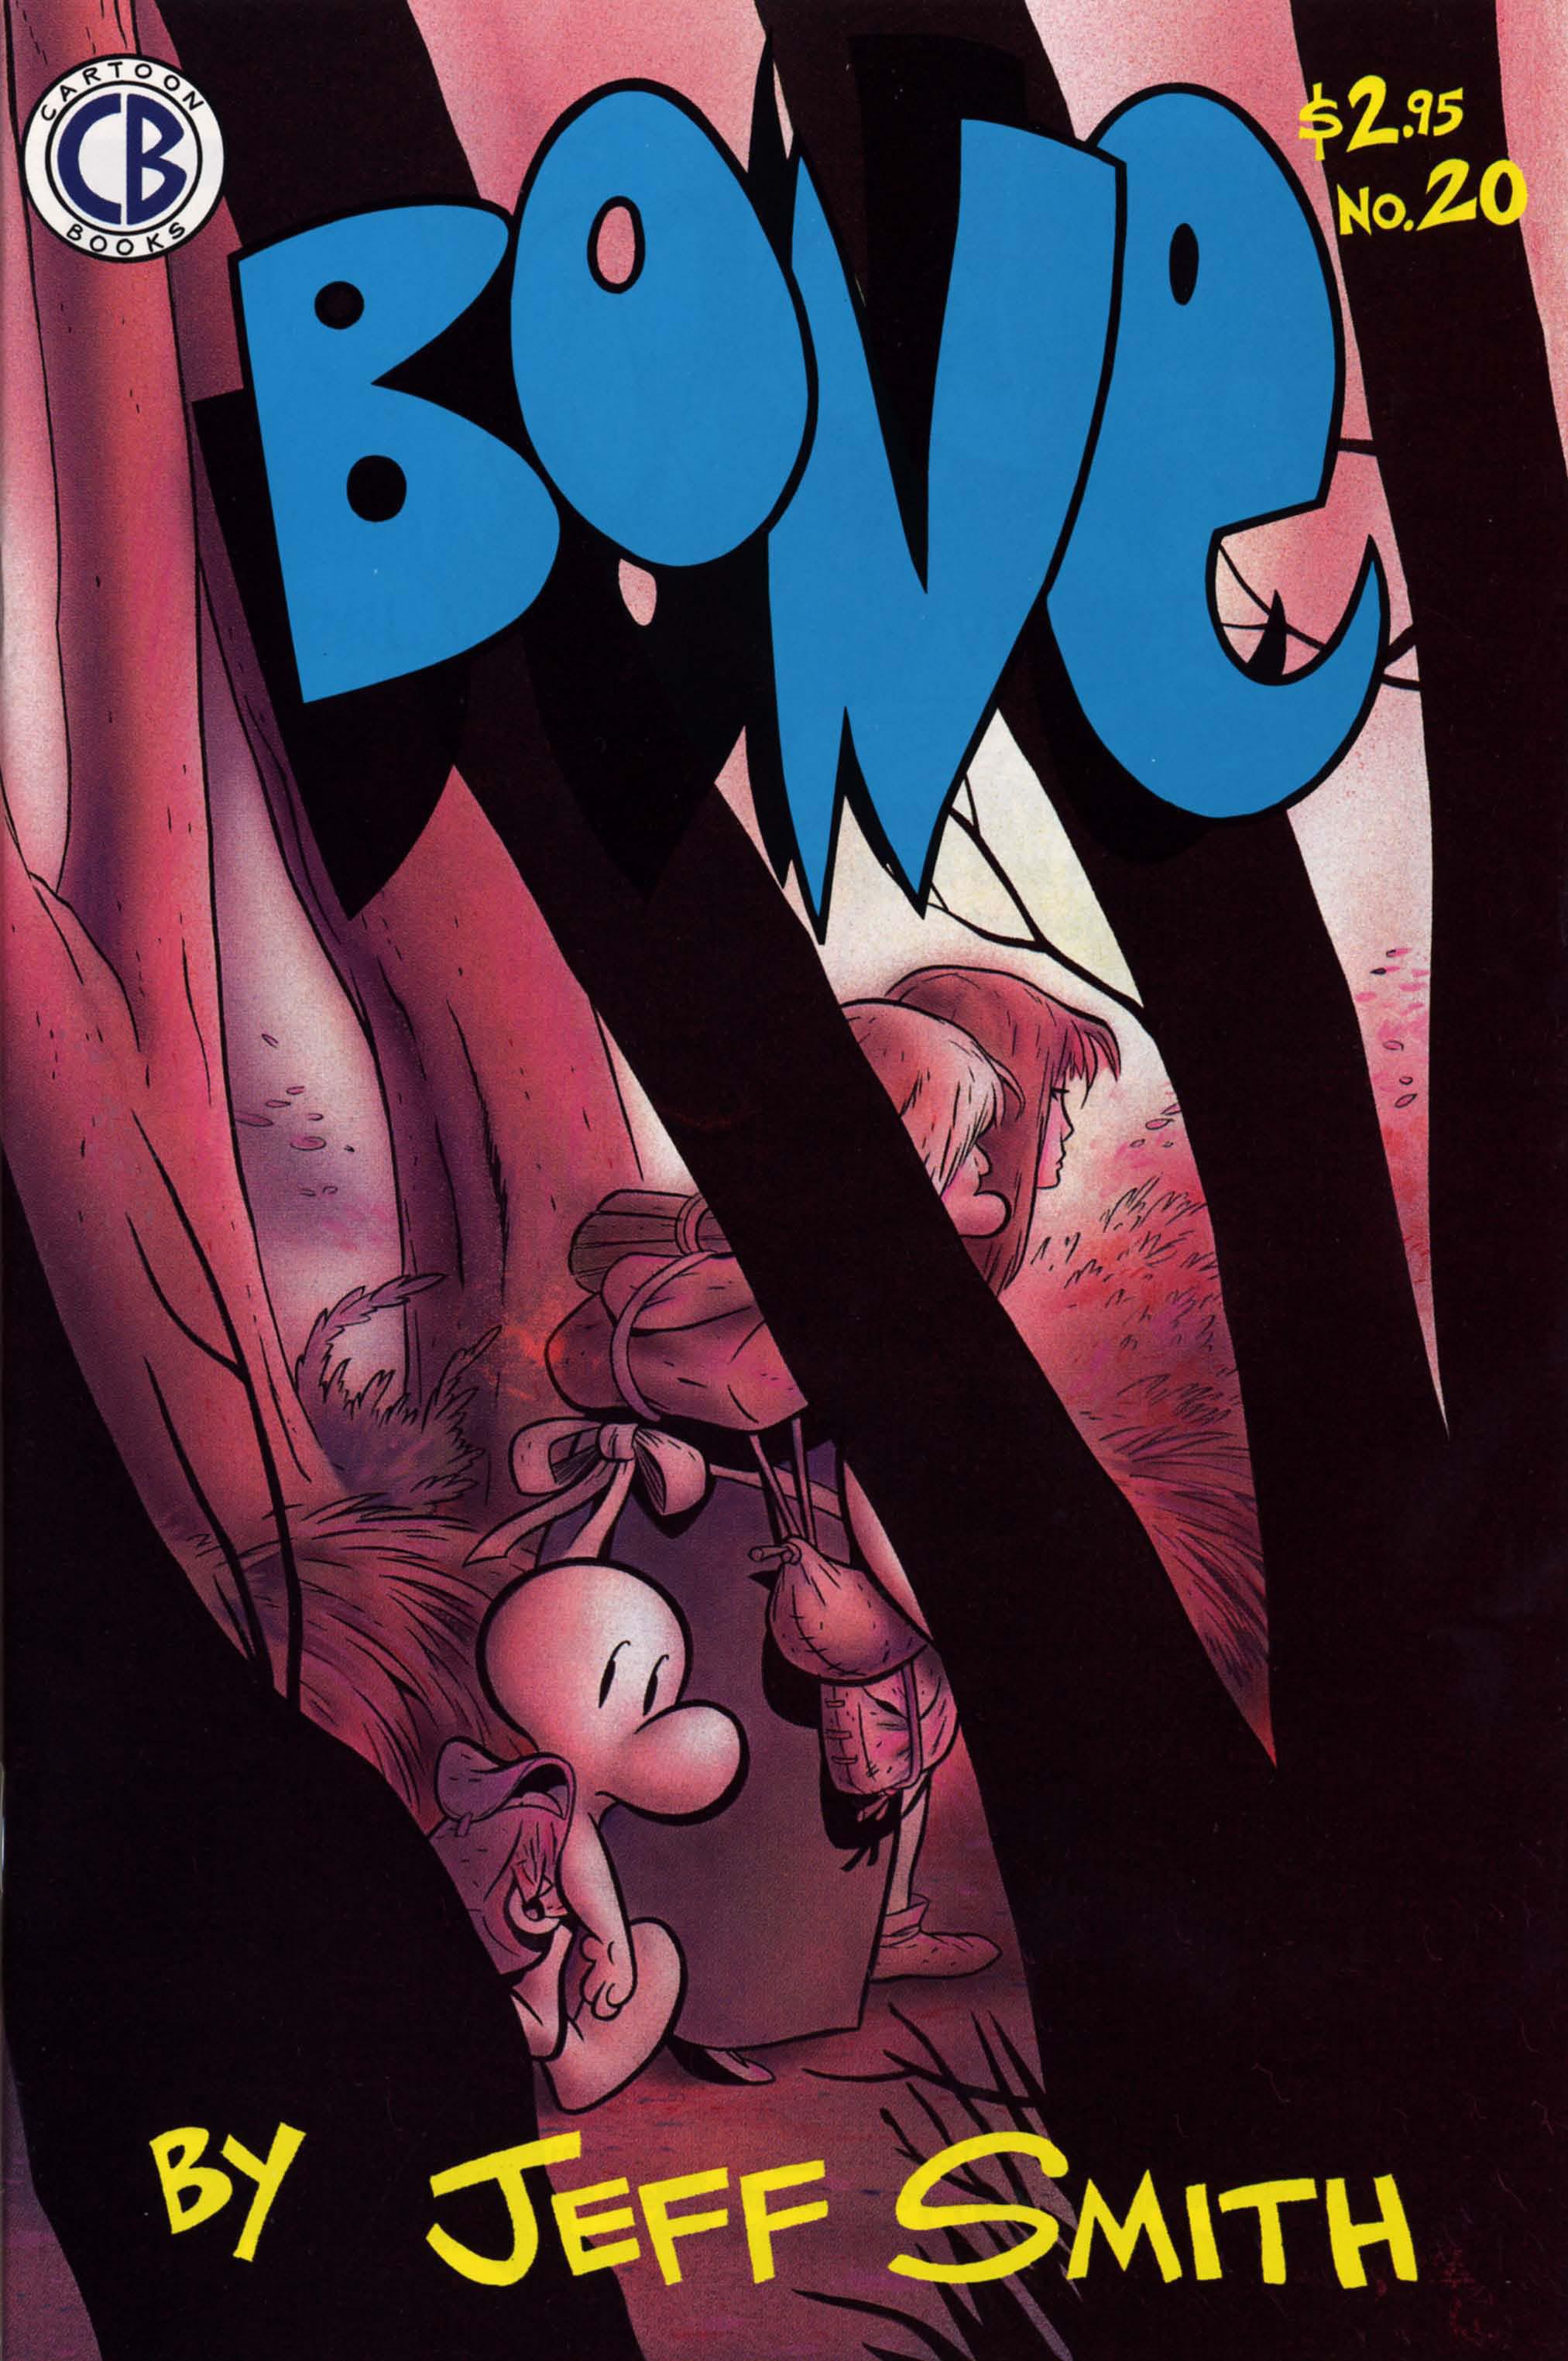 Bone 1991 Issue 20